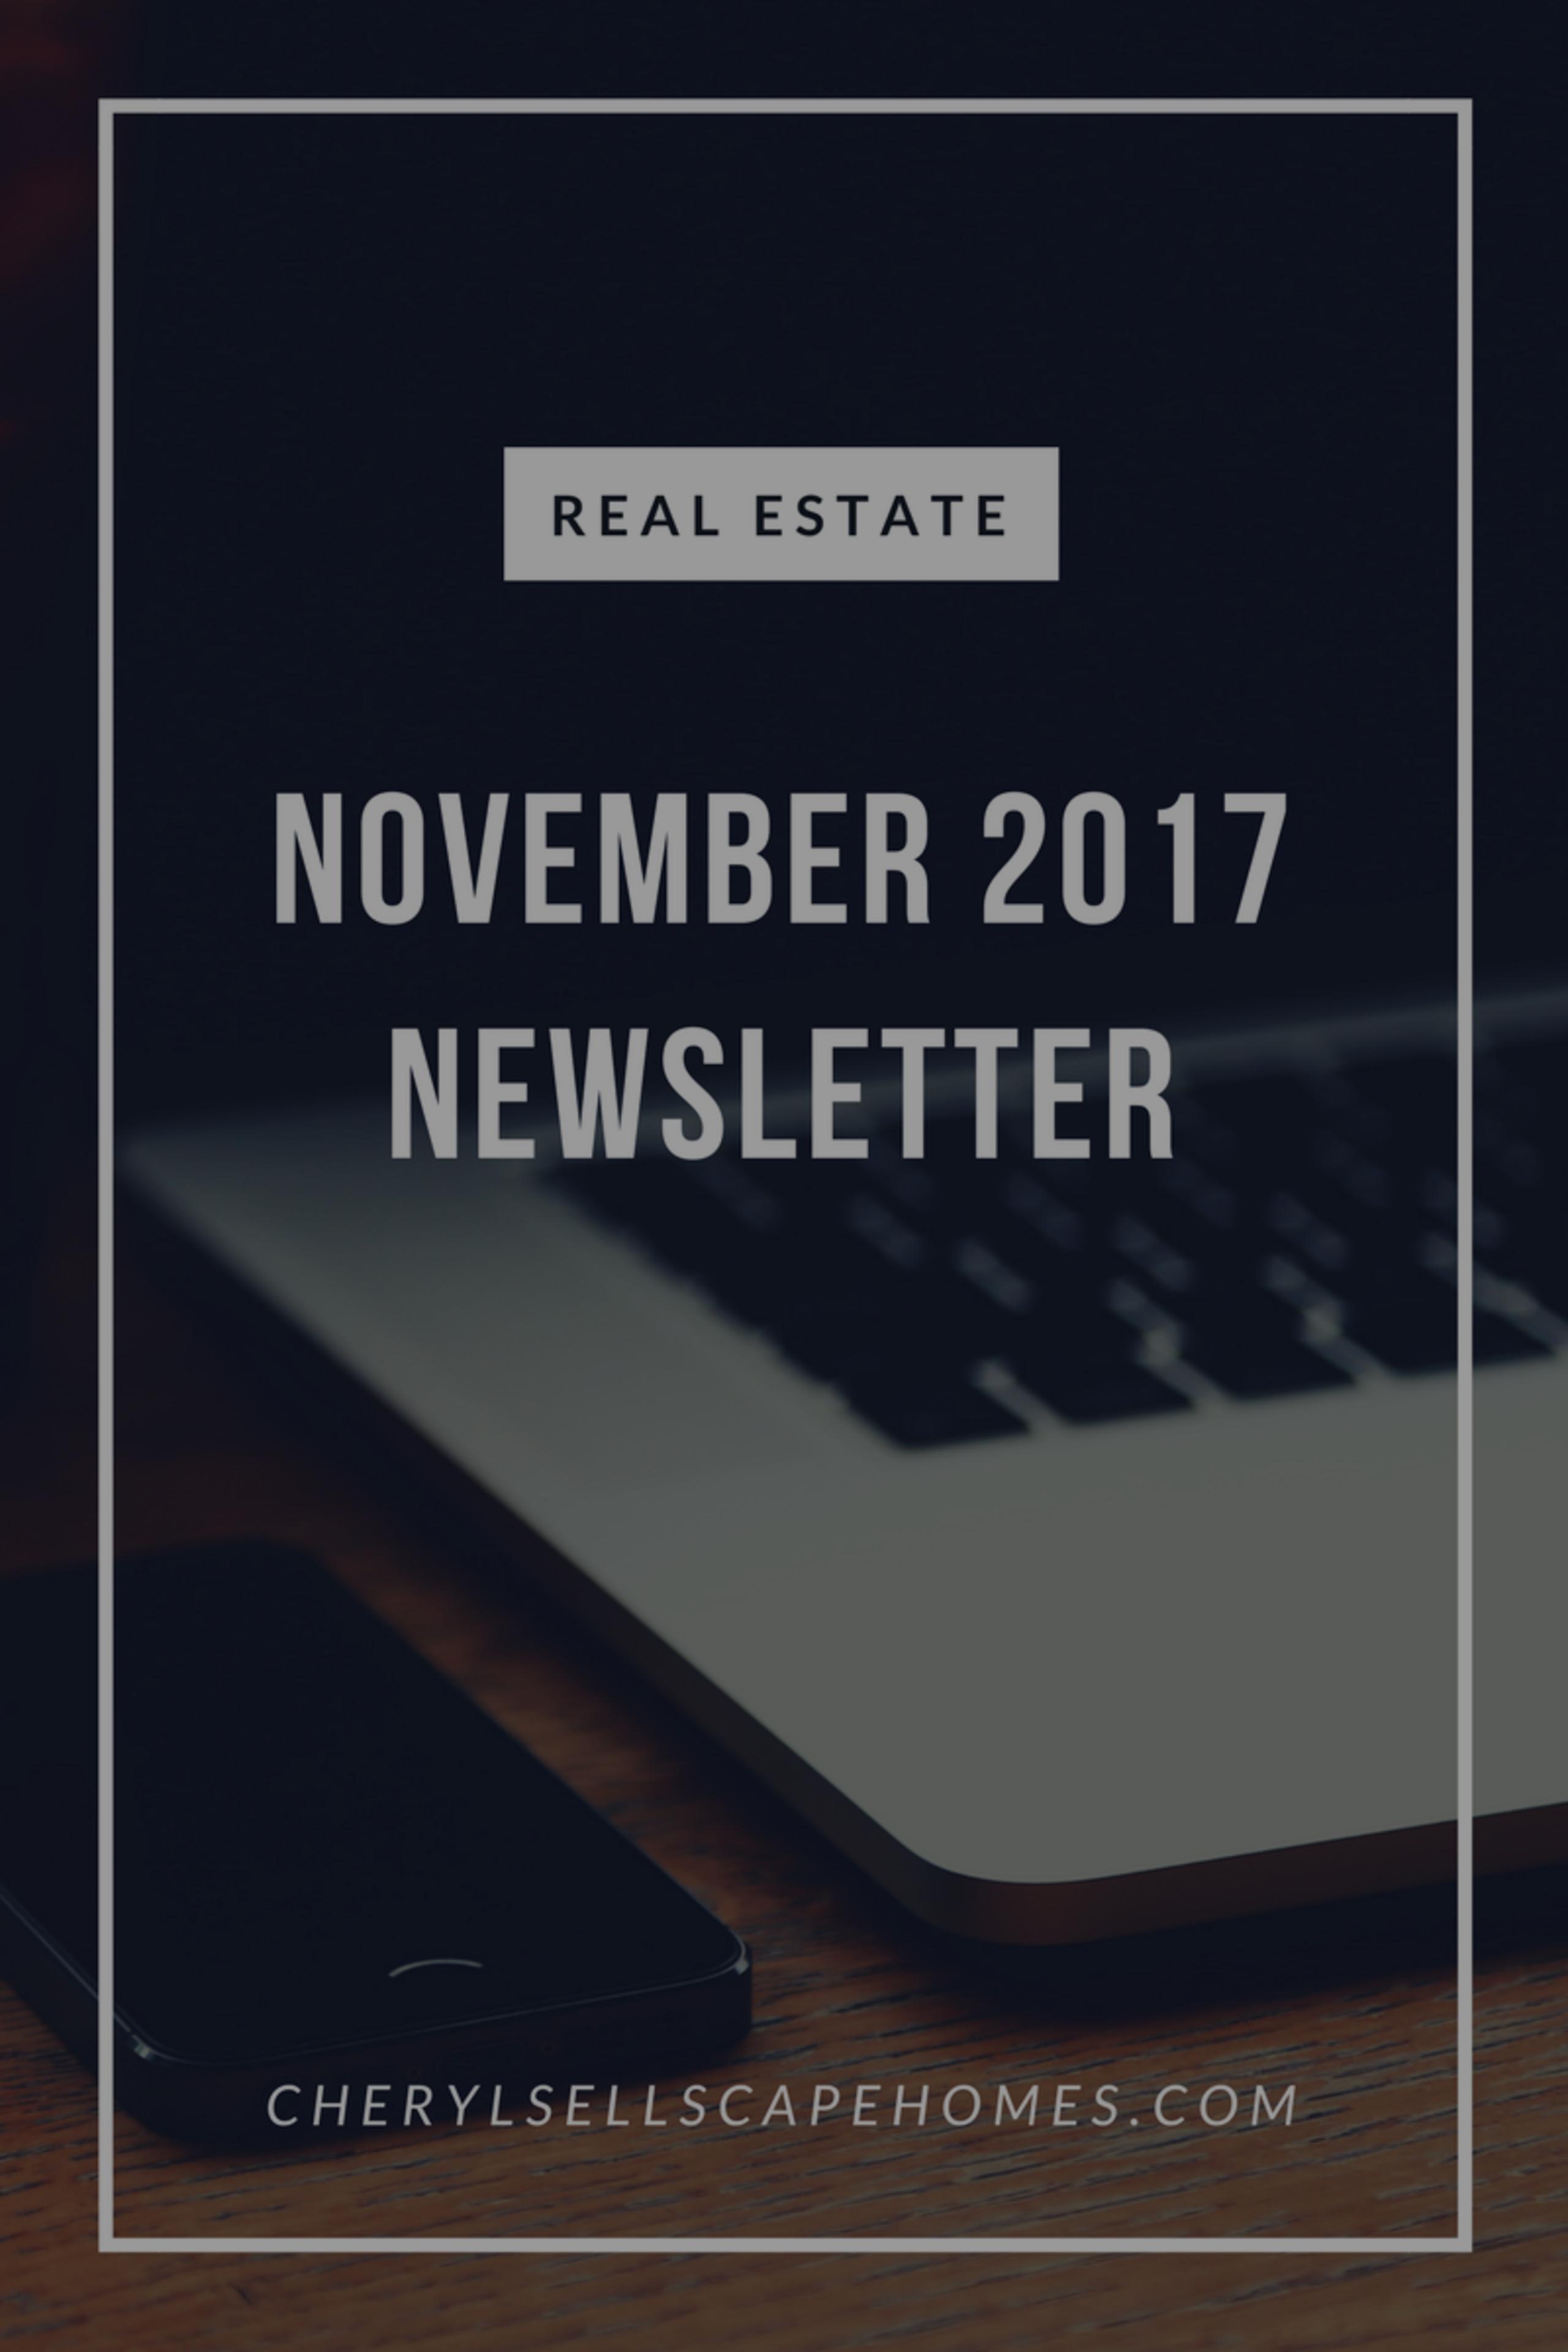 November 2017 real estate news for you